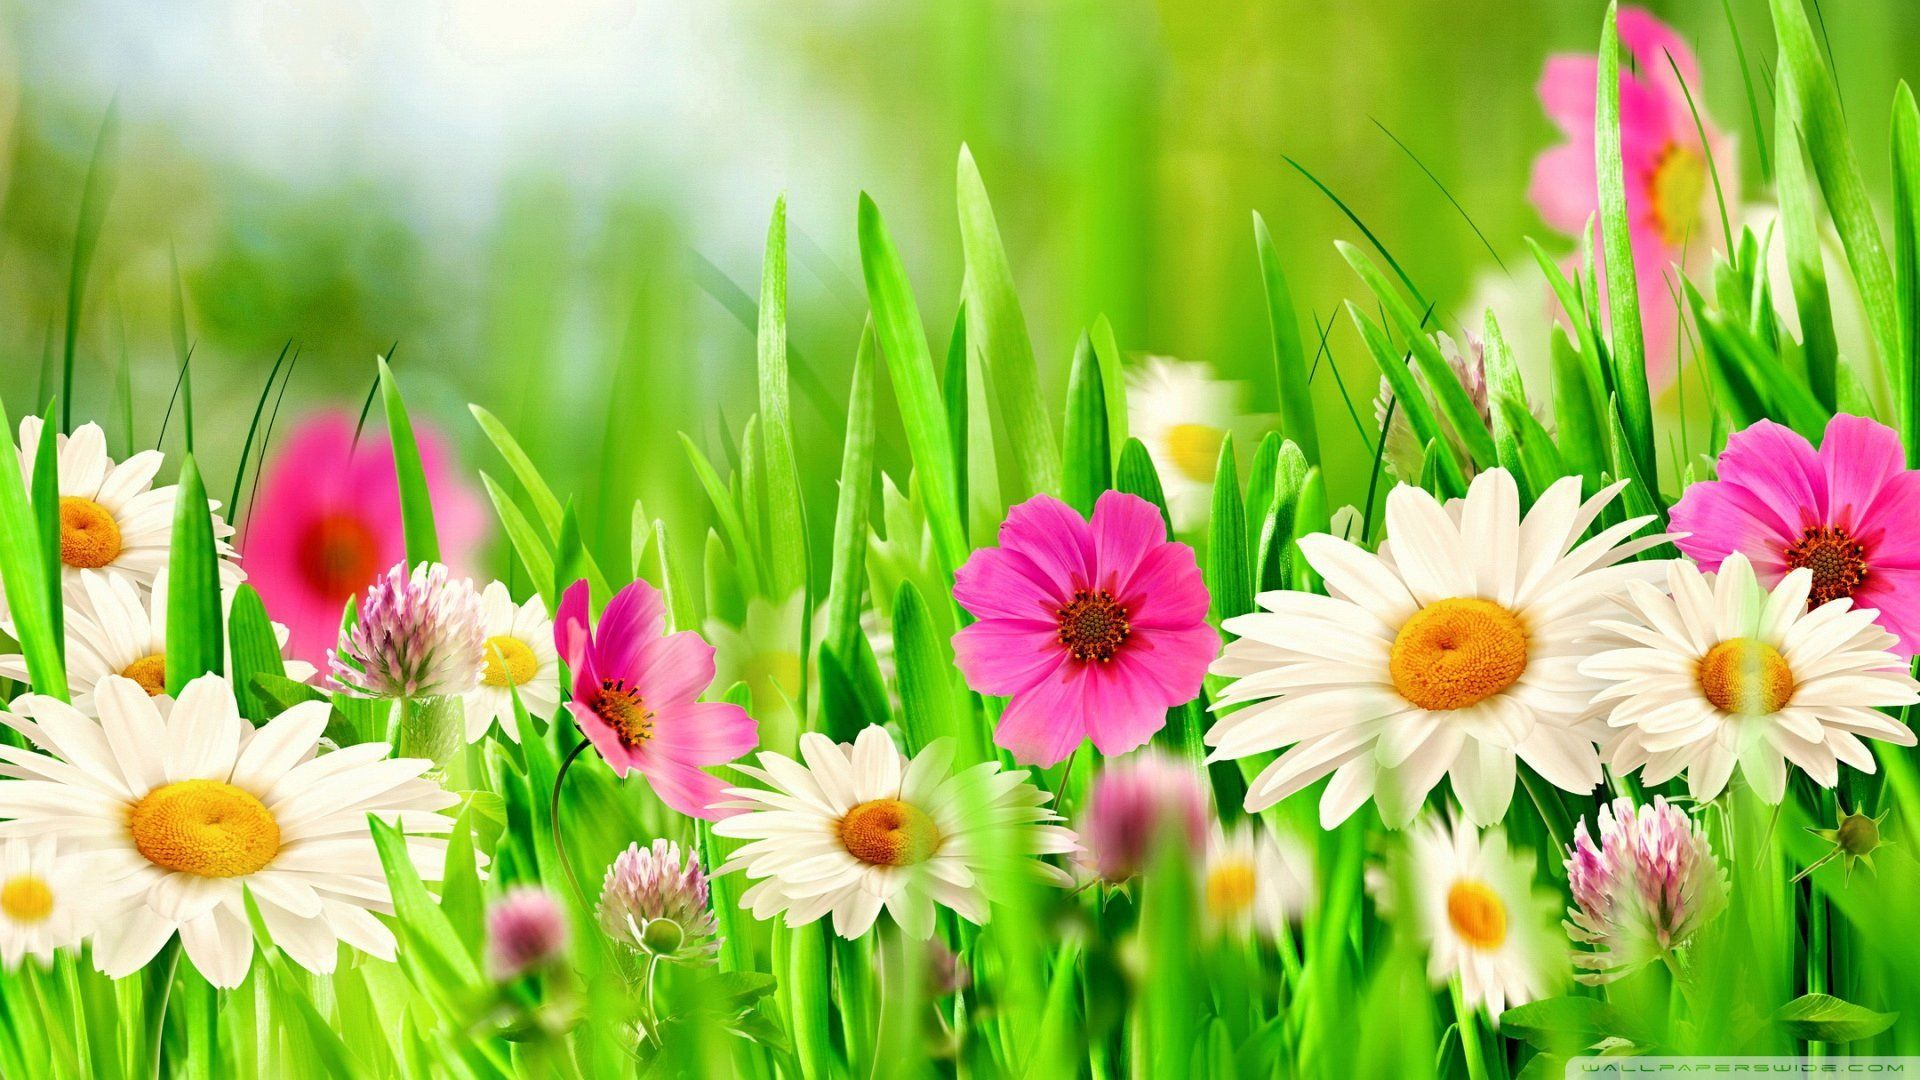 Full hd flower wallpapers top free full hd flower for Immagini full hd 1920x1080